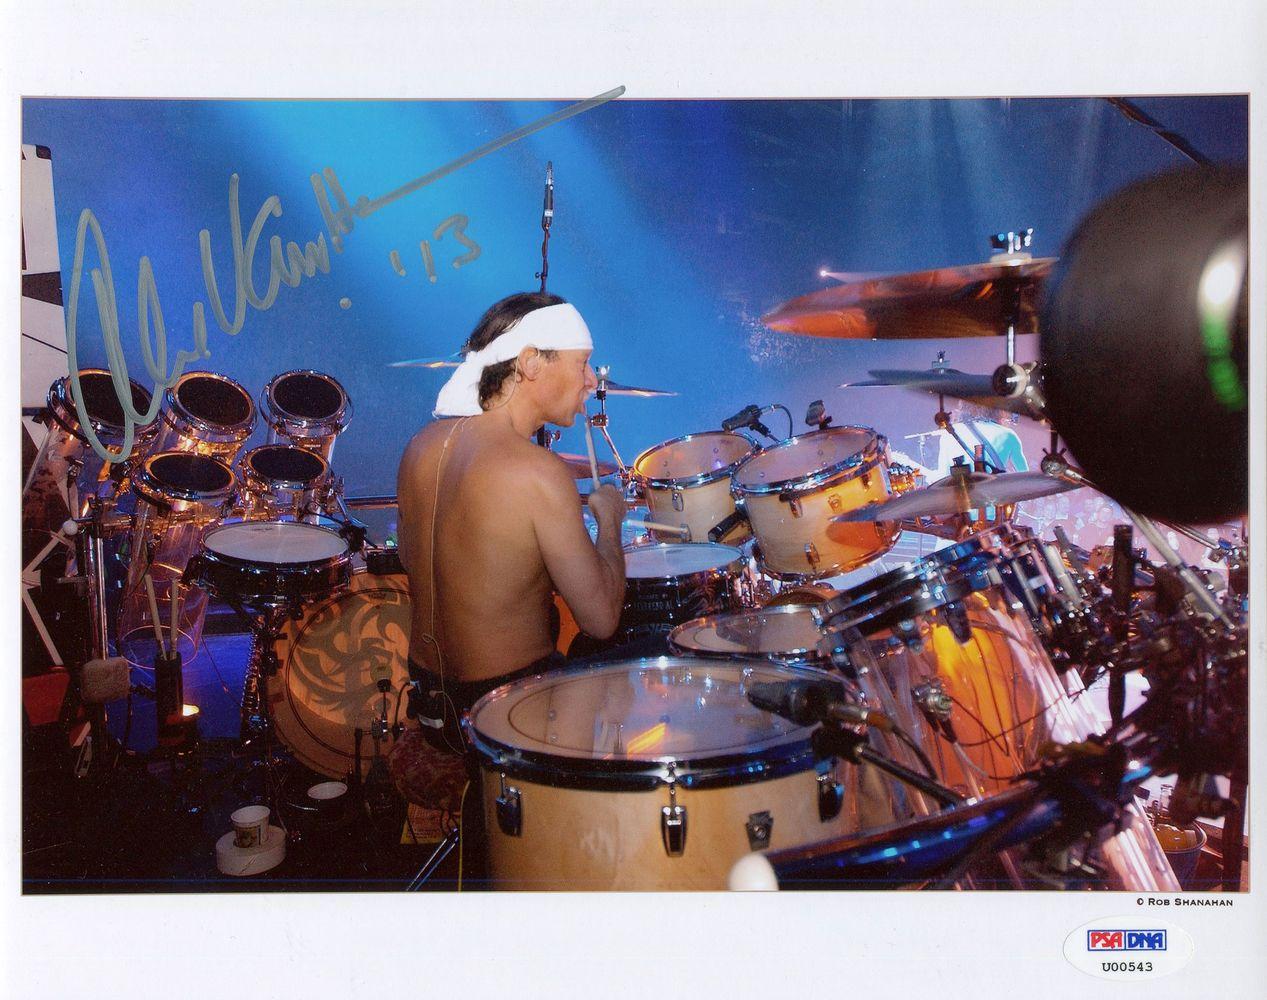 Van Halen Psa Autographfacts Wiring Diagram For Eddie View Gallery